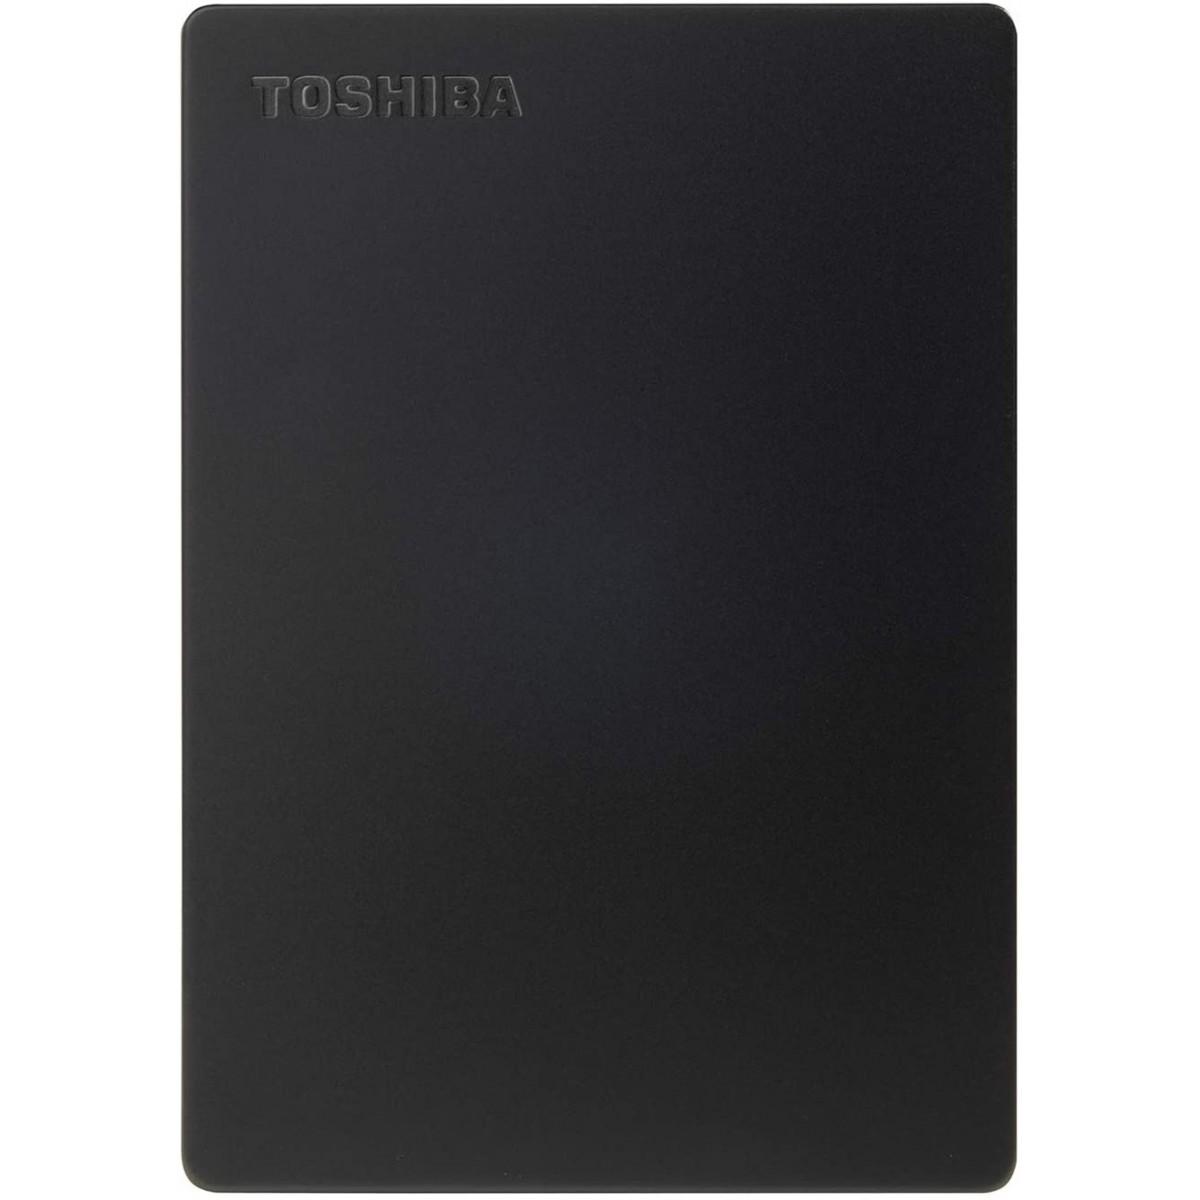 HD Externo Toshiba Canvio Slim 2TB, USB 3.0, Até 5Gb/s, HDTD320XK3EA